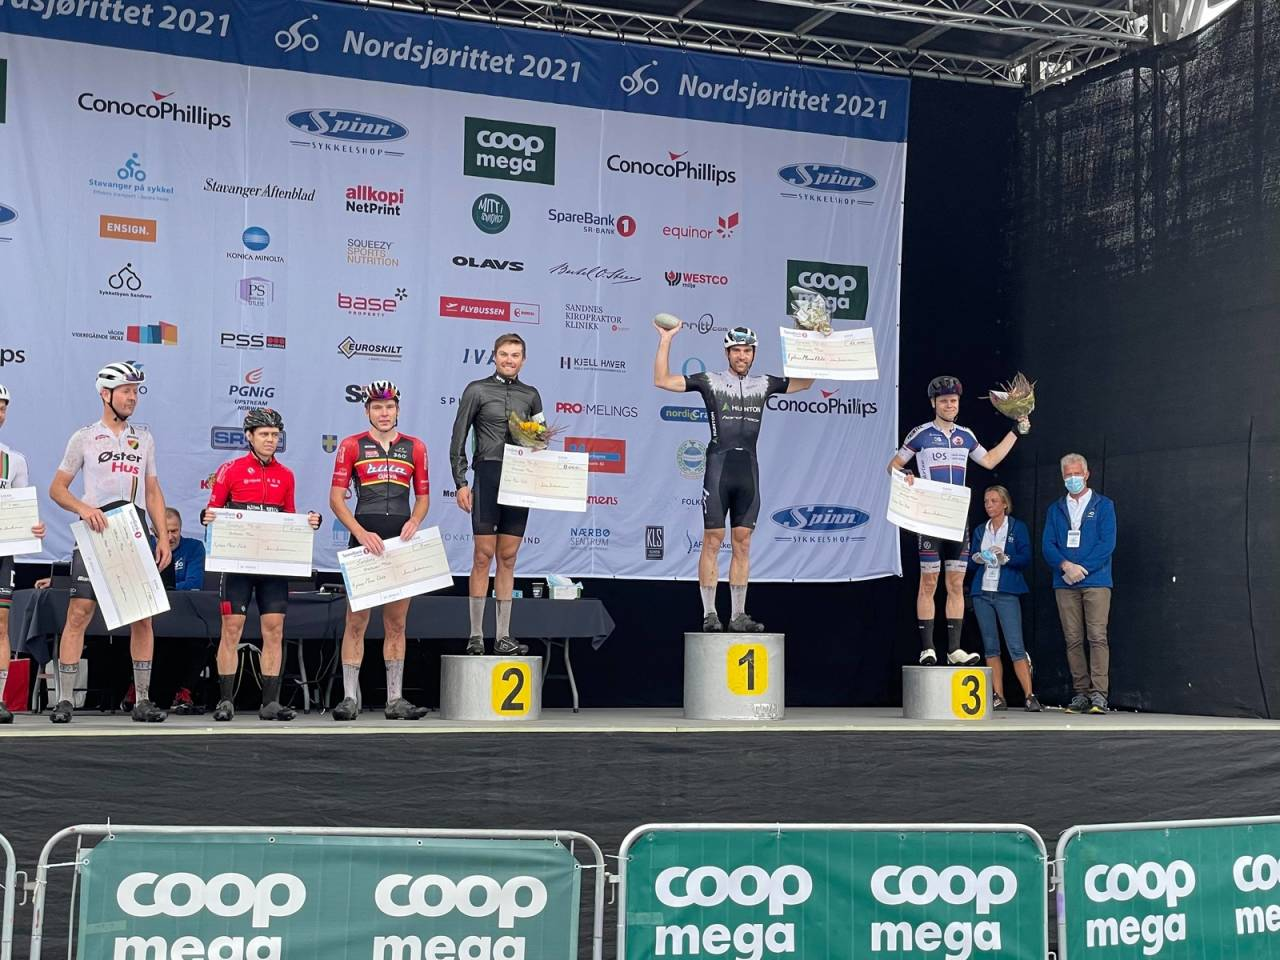 Vidar Mehl vant Nordsjørittet 2021